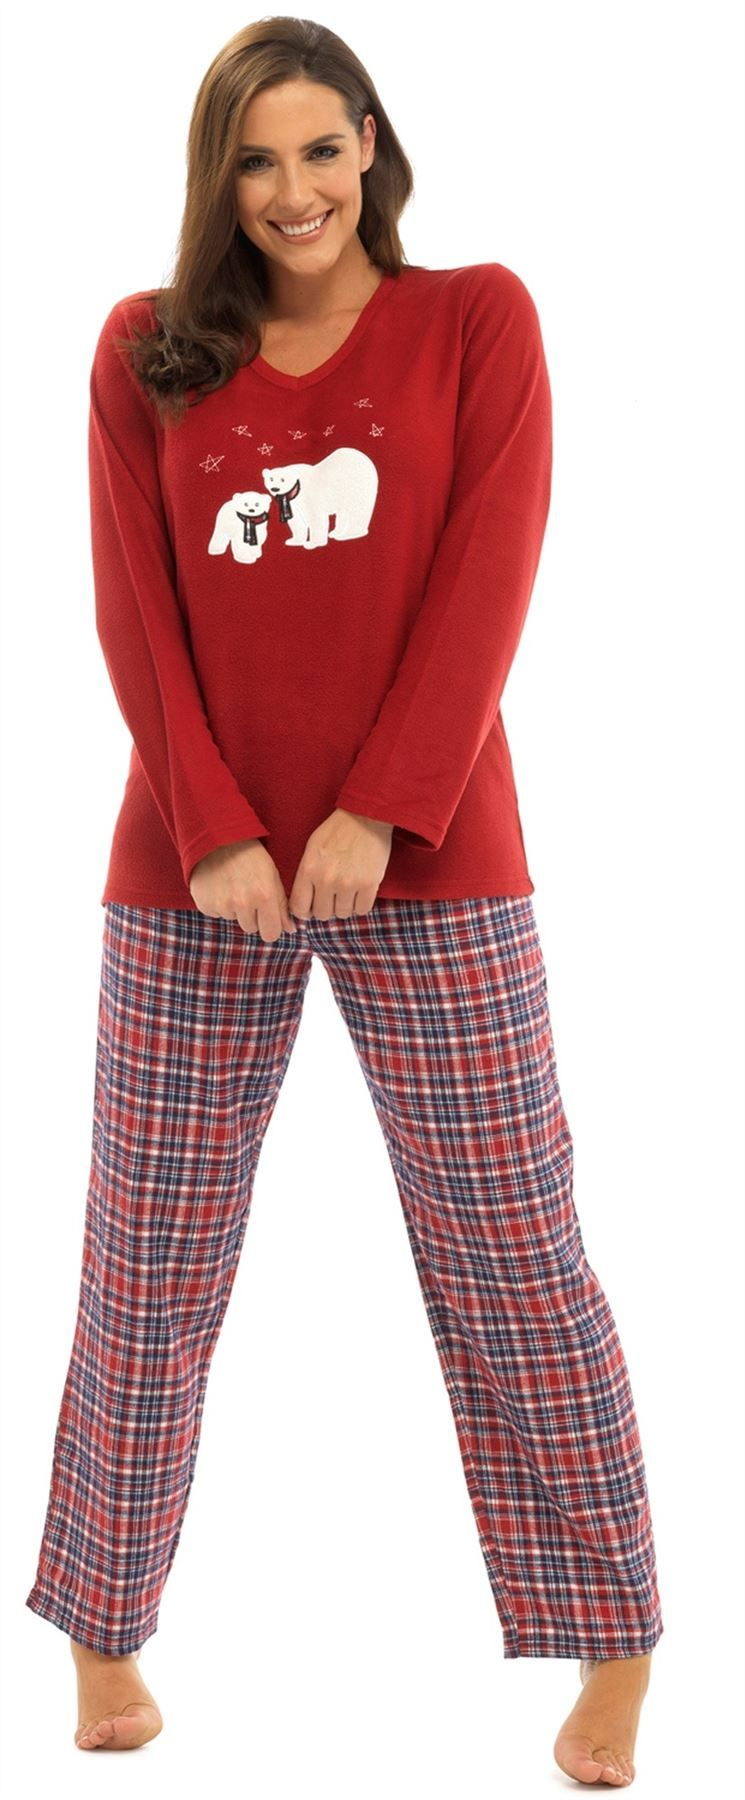 be9e89e29 Para Mujer Reno Y Oso Polar De Navidad De Lujo Polar Pijamas eyemask por  foxbury